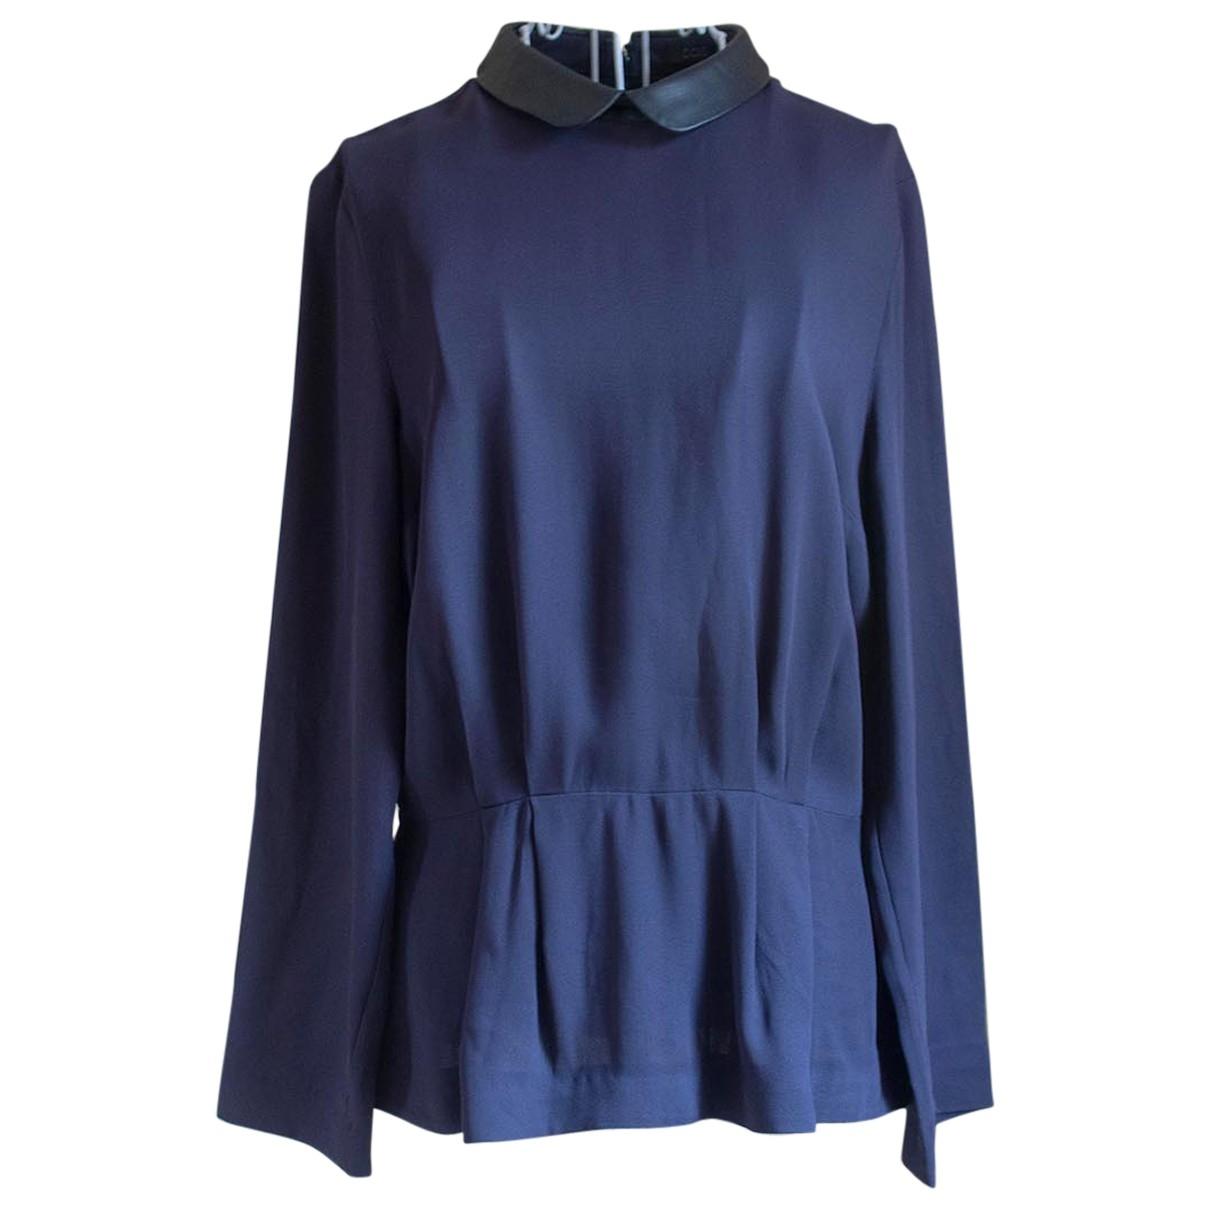 Cos \N Blue  top for Women S International